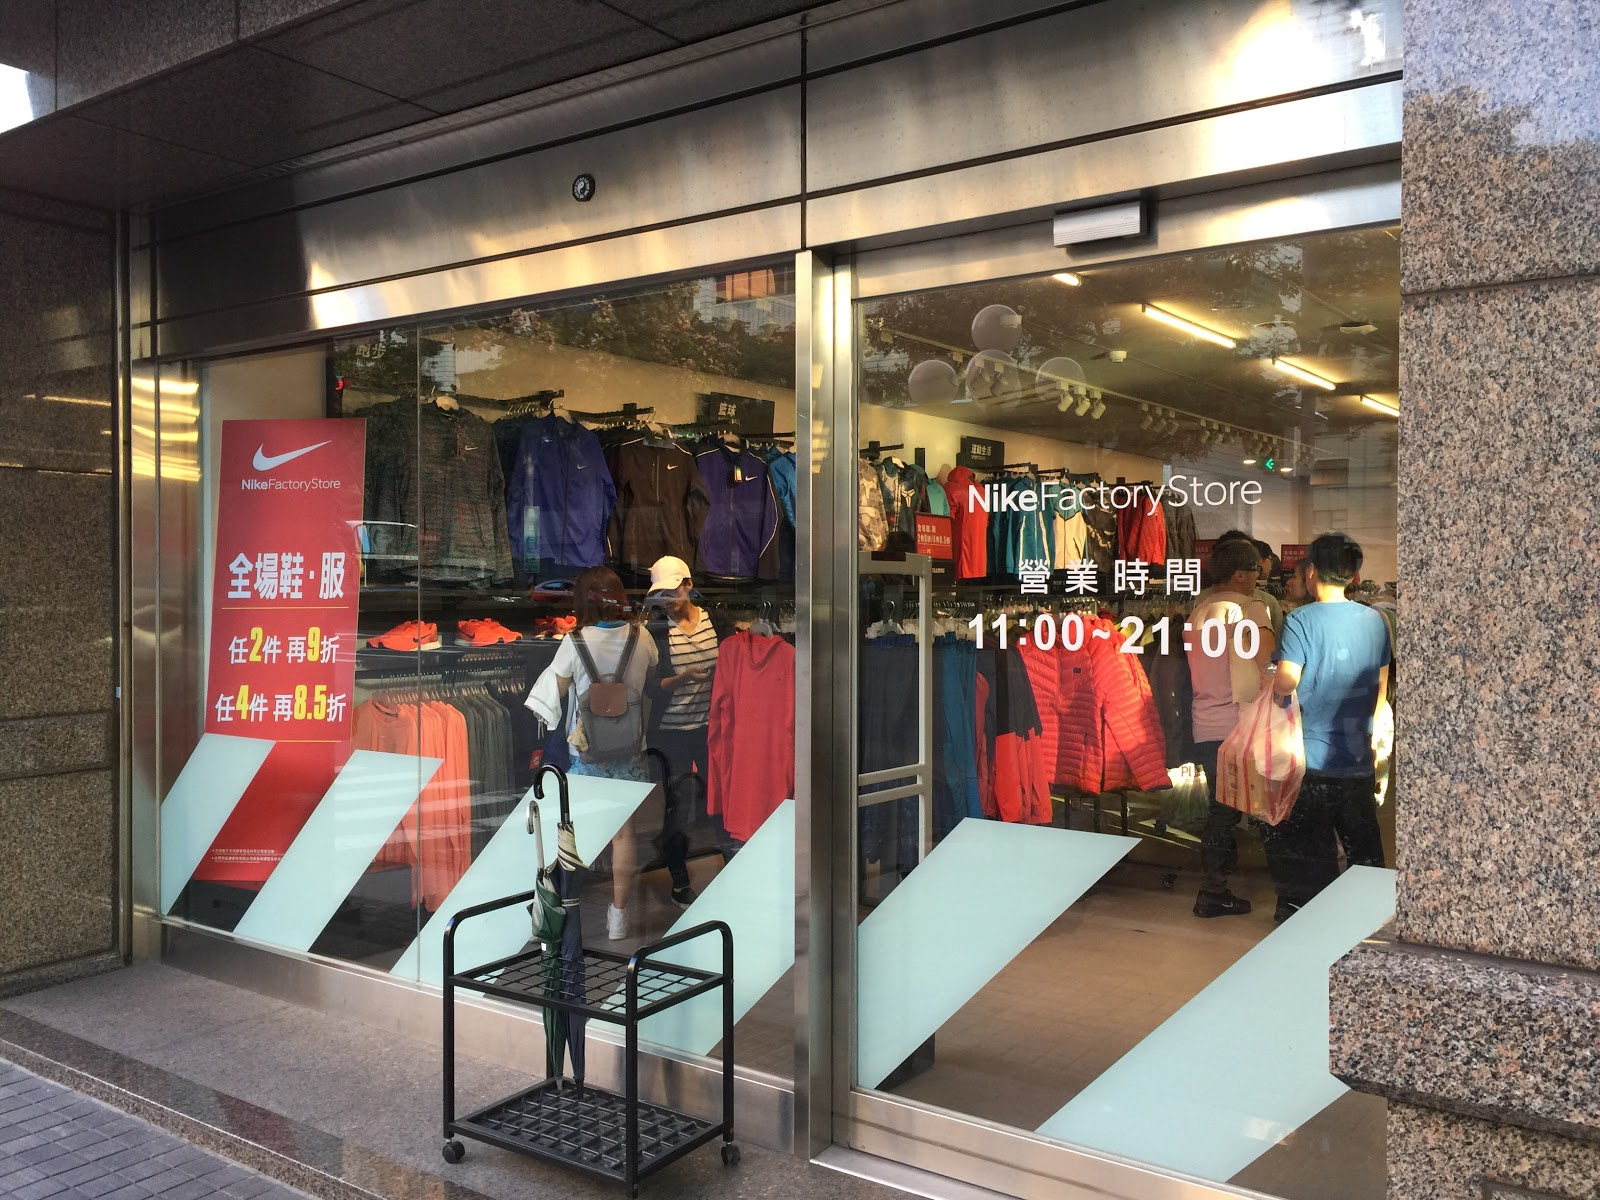 algun lado Circunferencia posponer  Tripify - Nike Factory Store Taipei Minsheng, Taipei